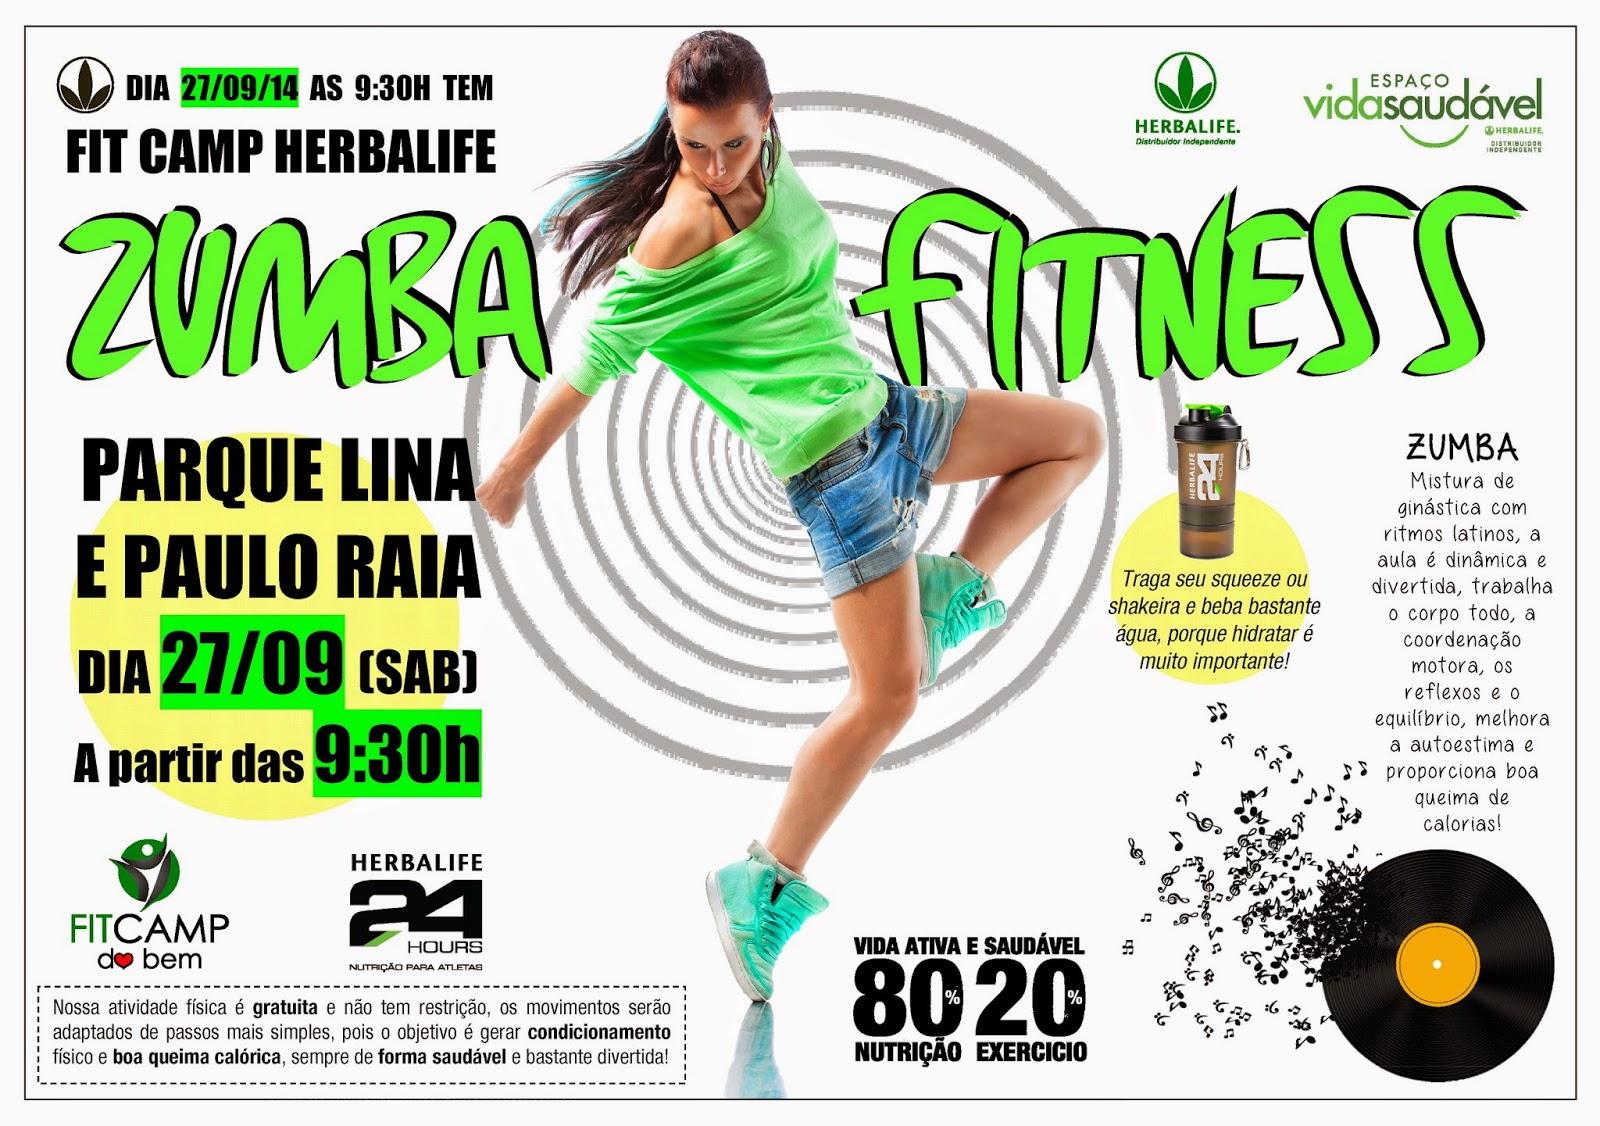 Fit Camp Herbalife com Zumba Fitness dia 27/09 (gratis) foco em vida saudavel